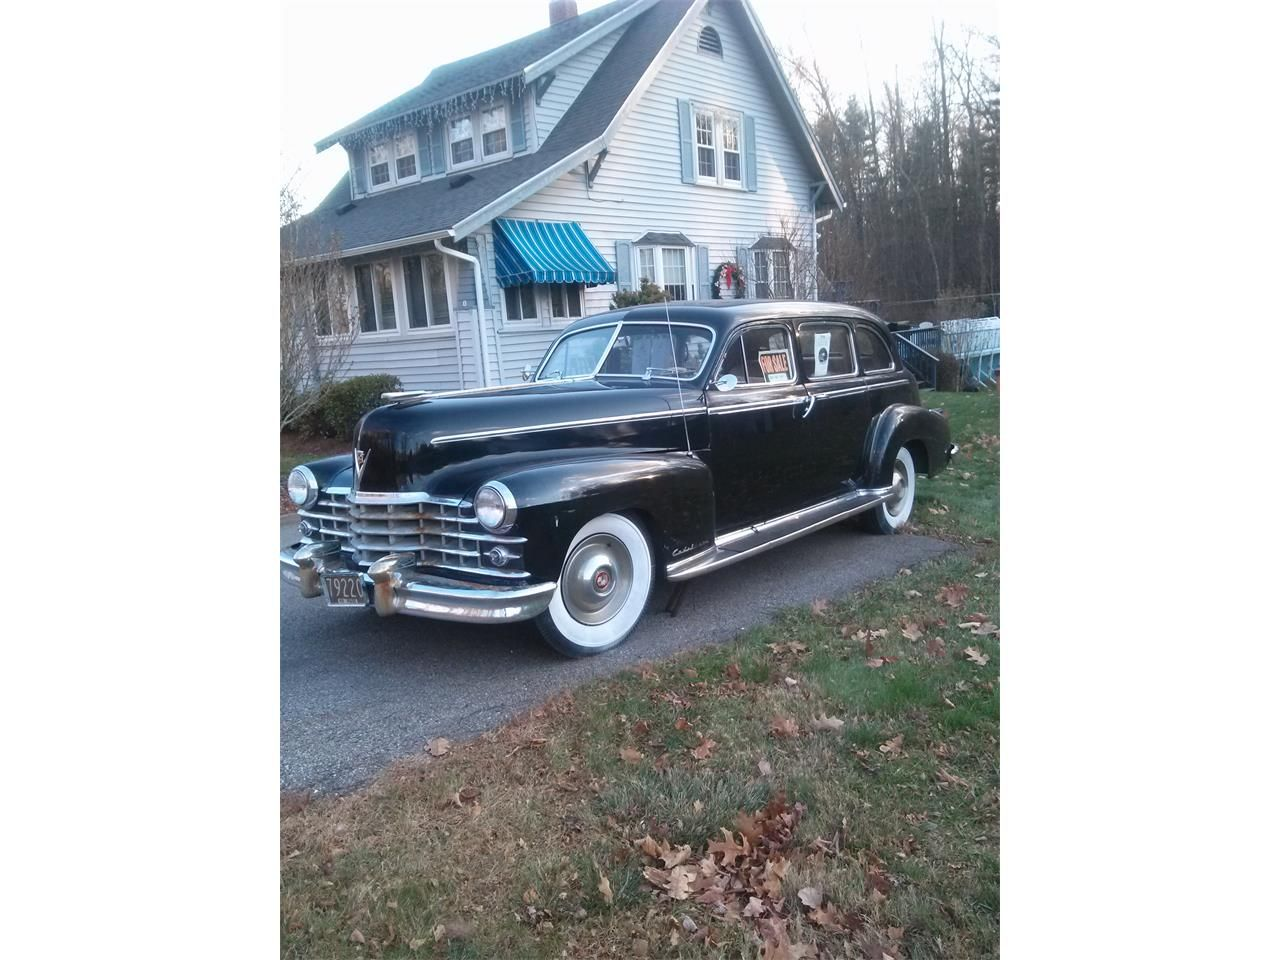 1948 Cadillac Fleetwood Limousine | Cadillacs | Pinterest | Cadillac ...